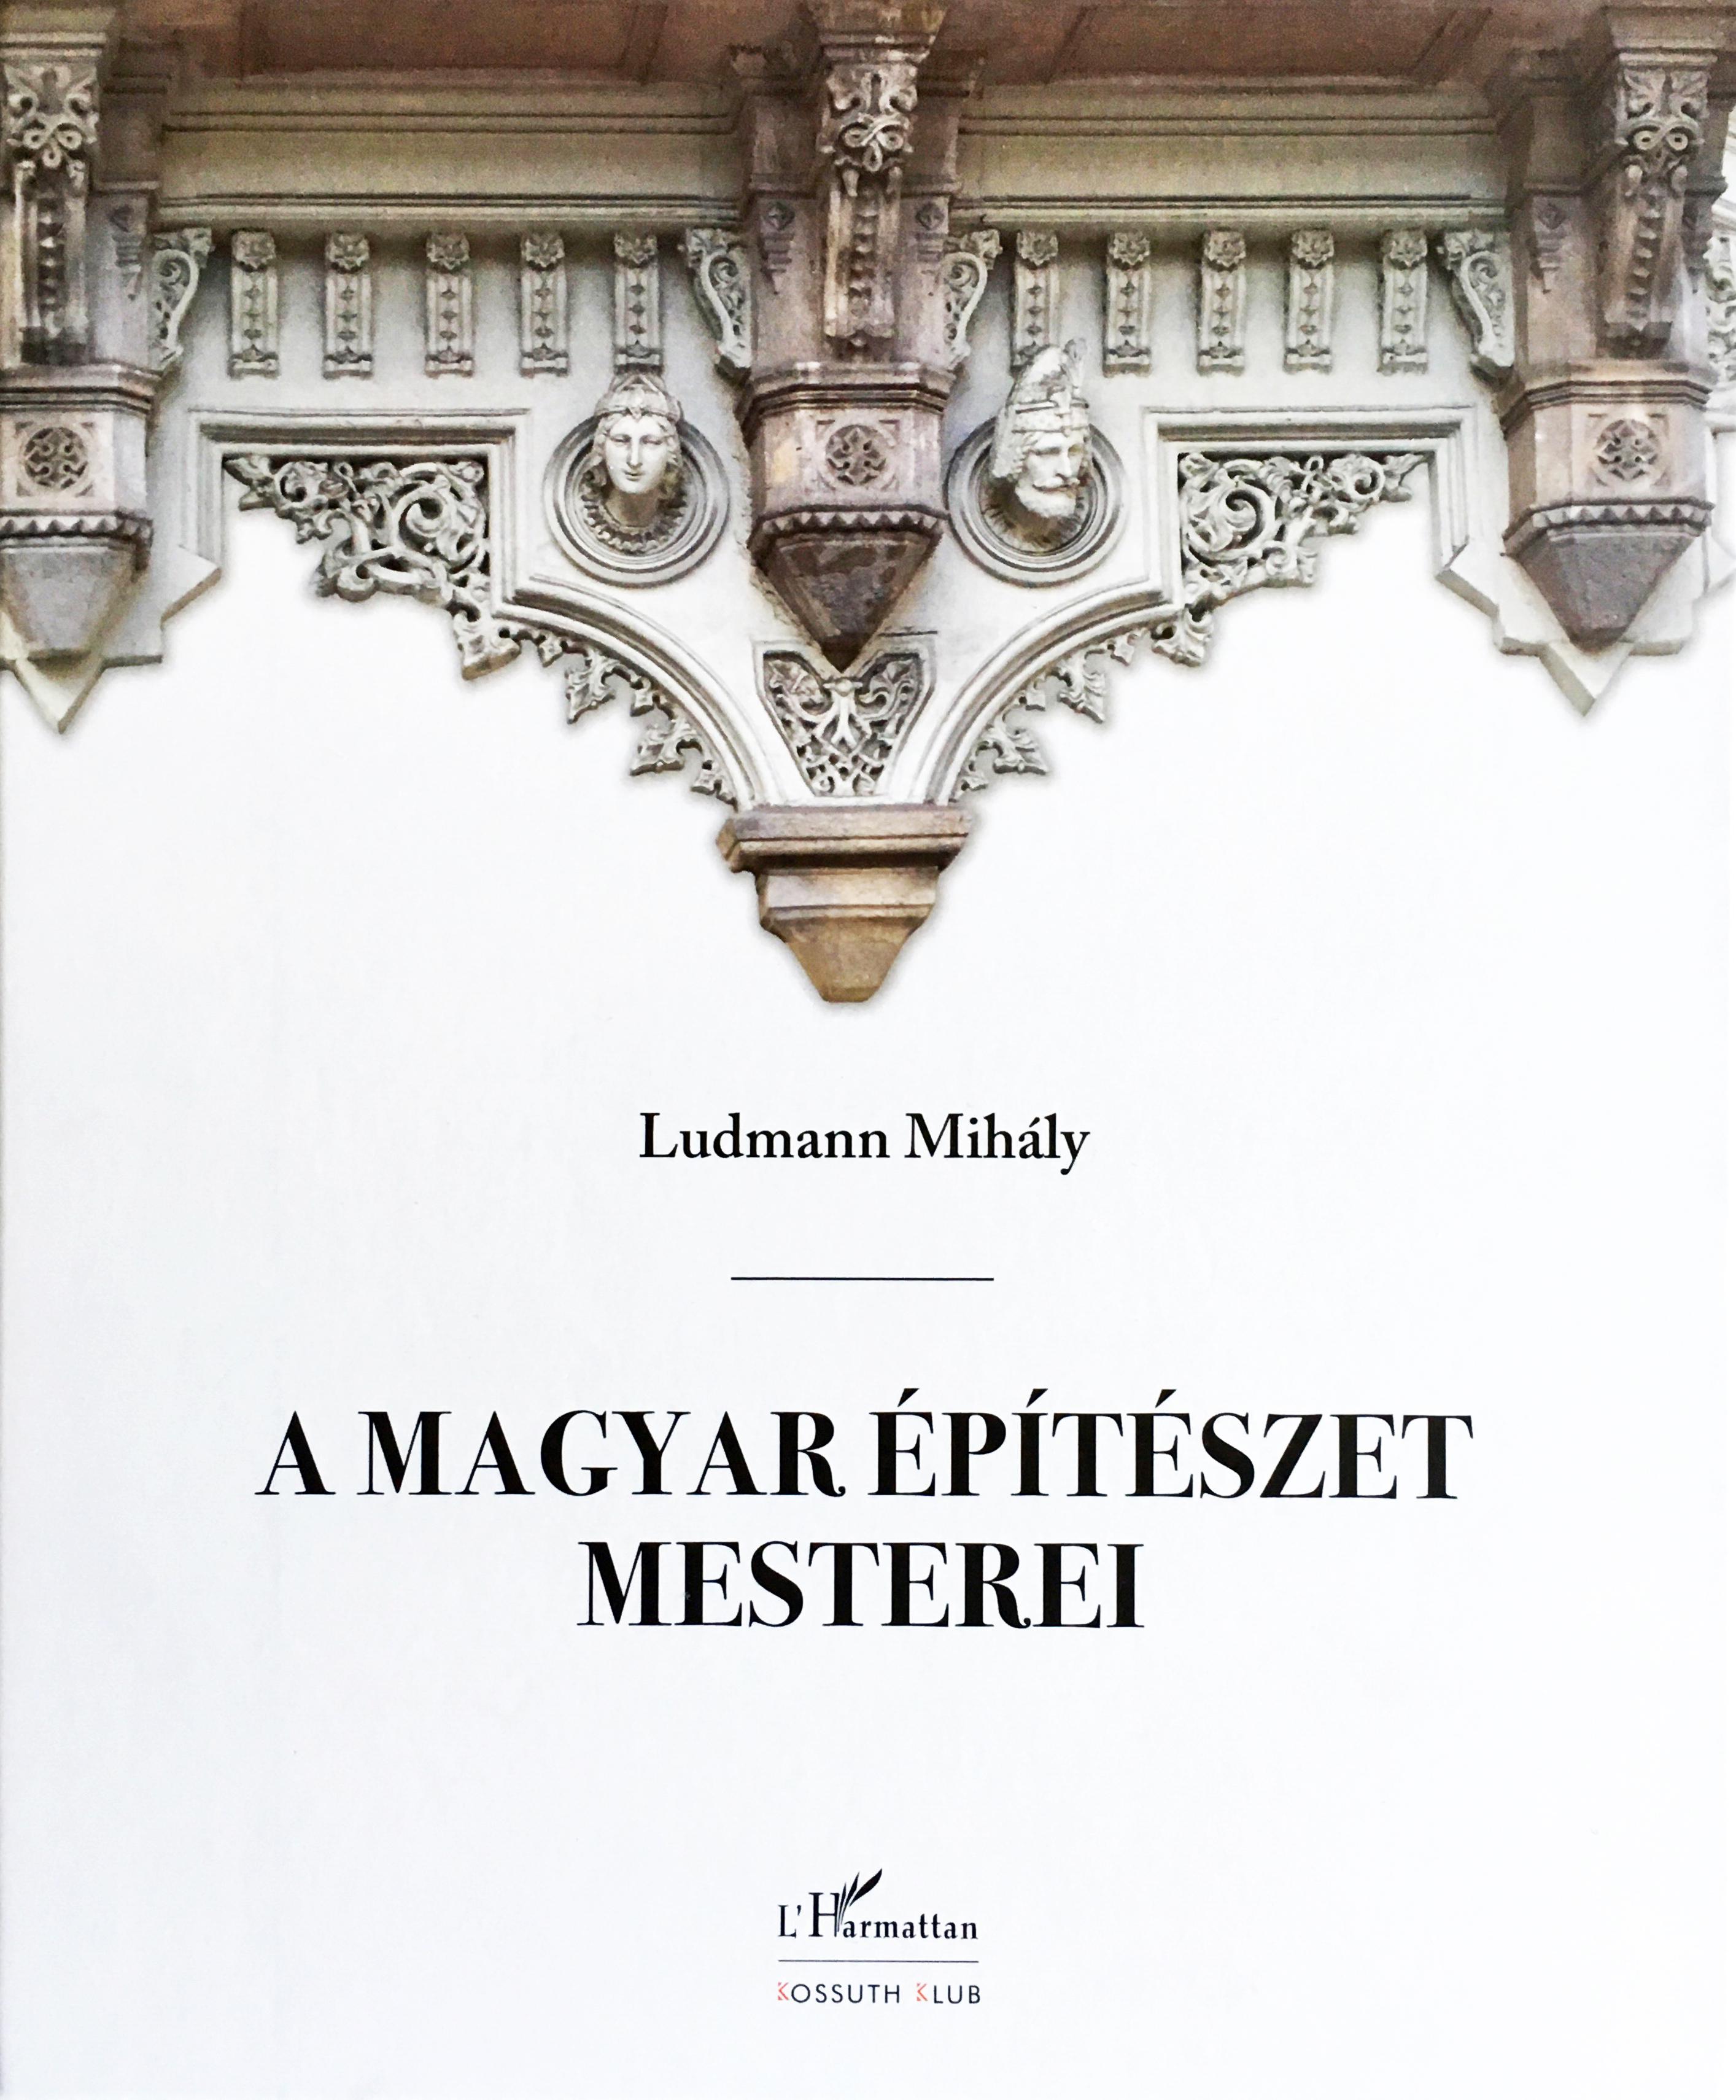 ludmann_mihaly02.JPG